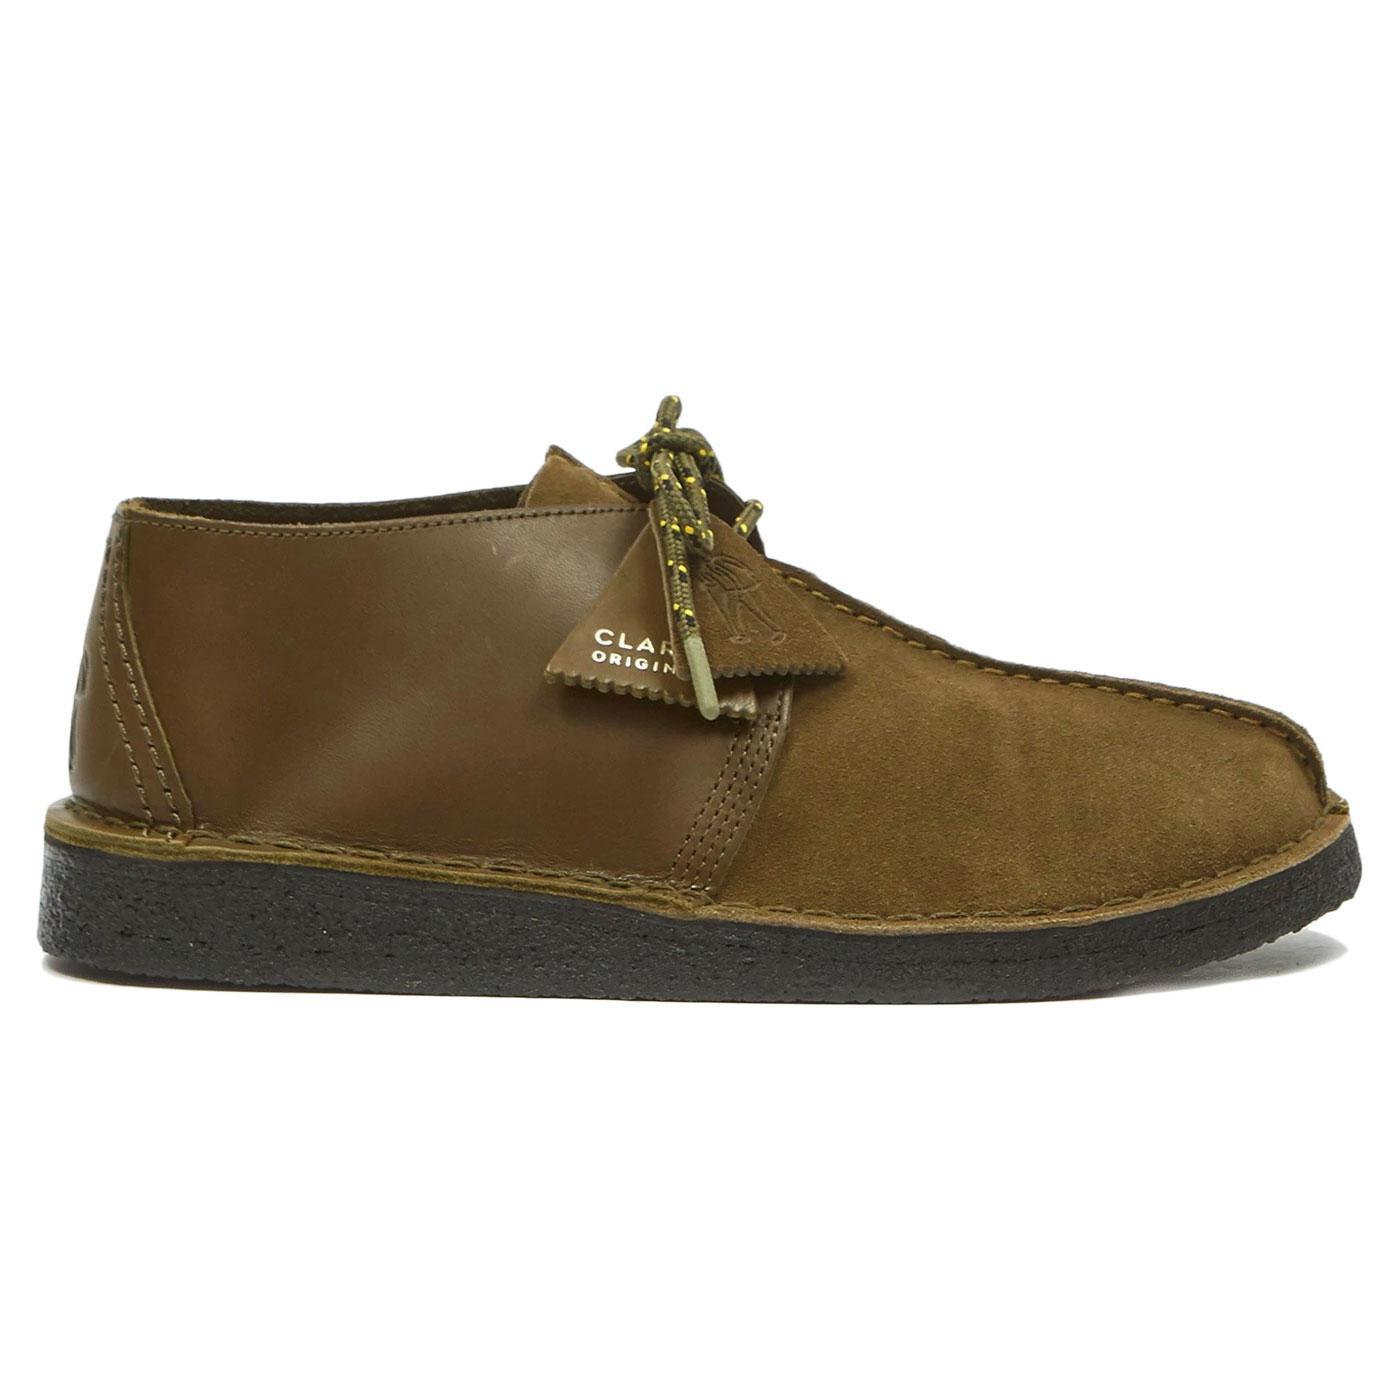 Desert Trek CLARKS ORIGINALS Retro Mod Shoes (OC